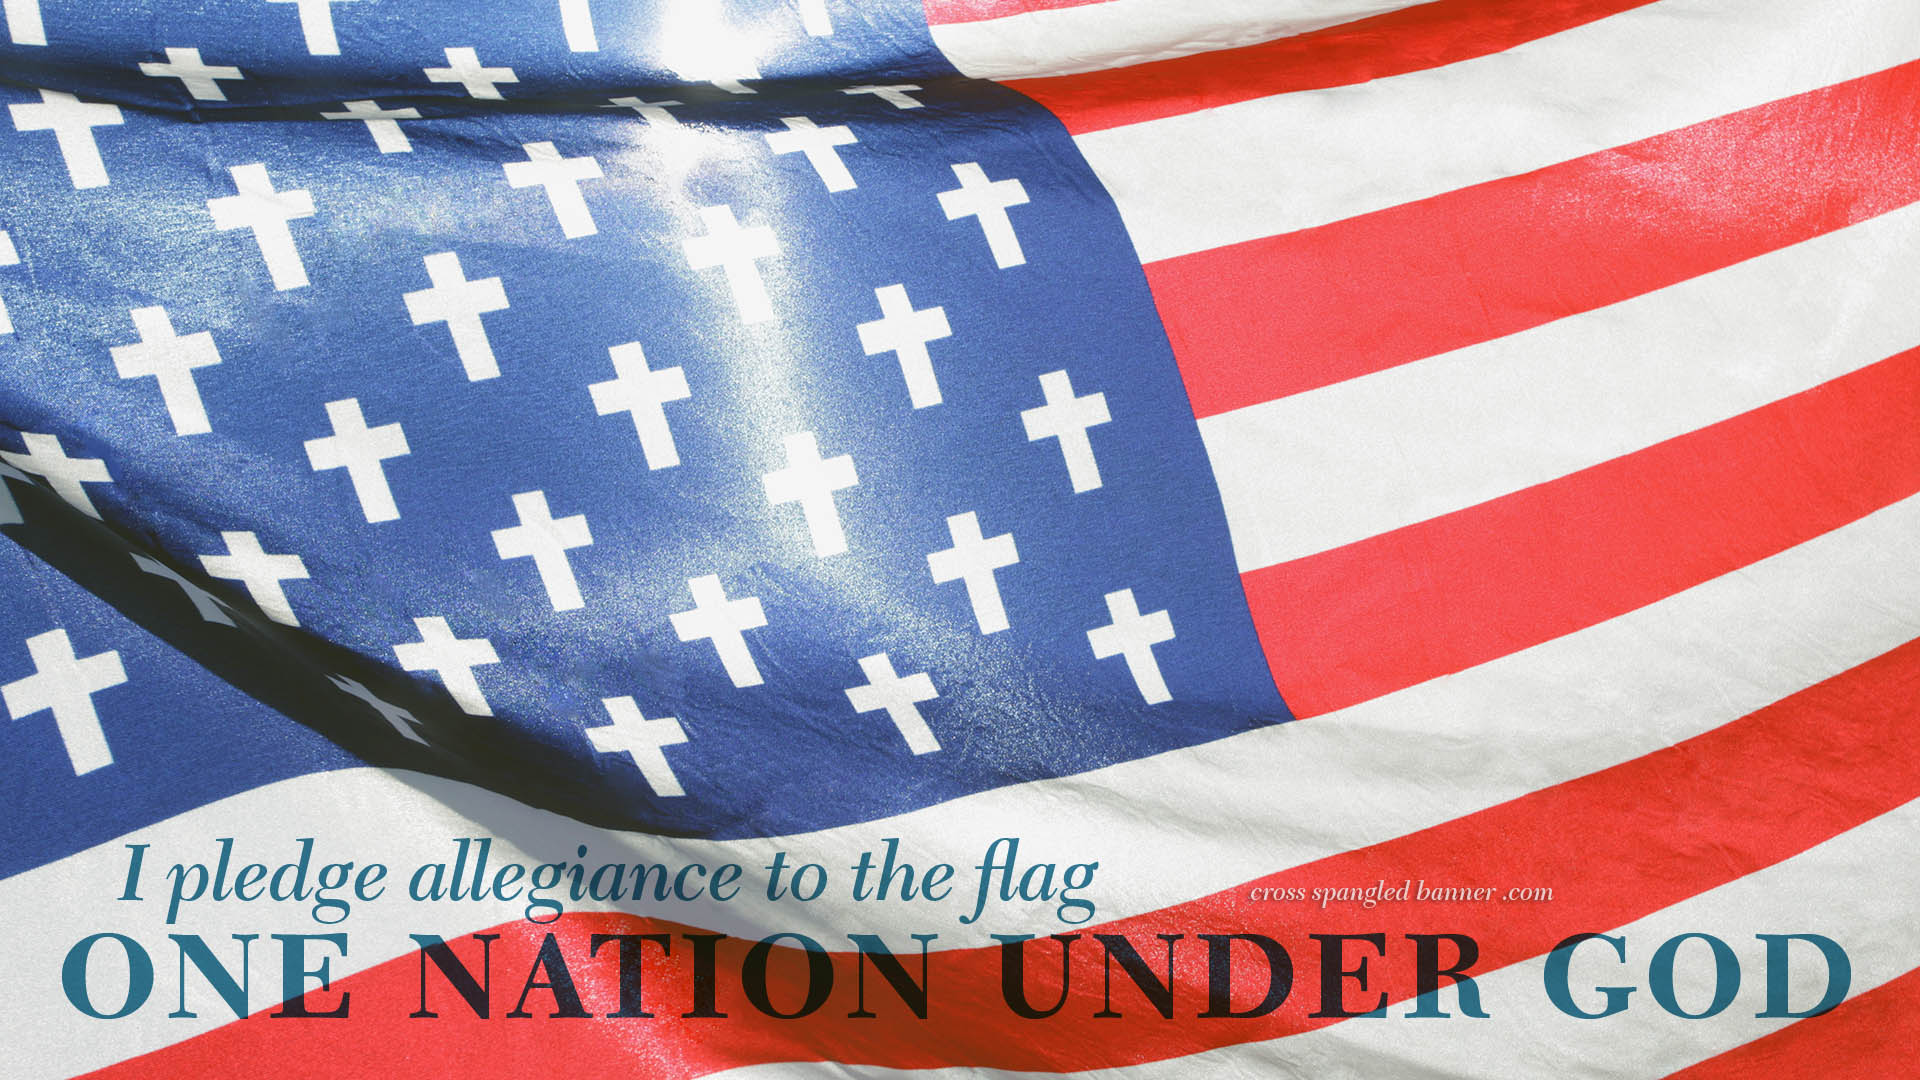 GREATEST Piece Of Christian Americana EVER Zack Hunt 1920x1080